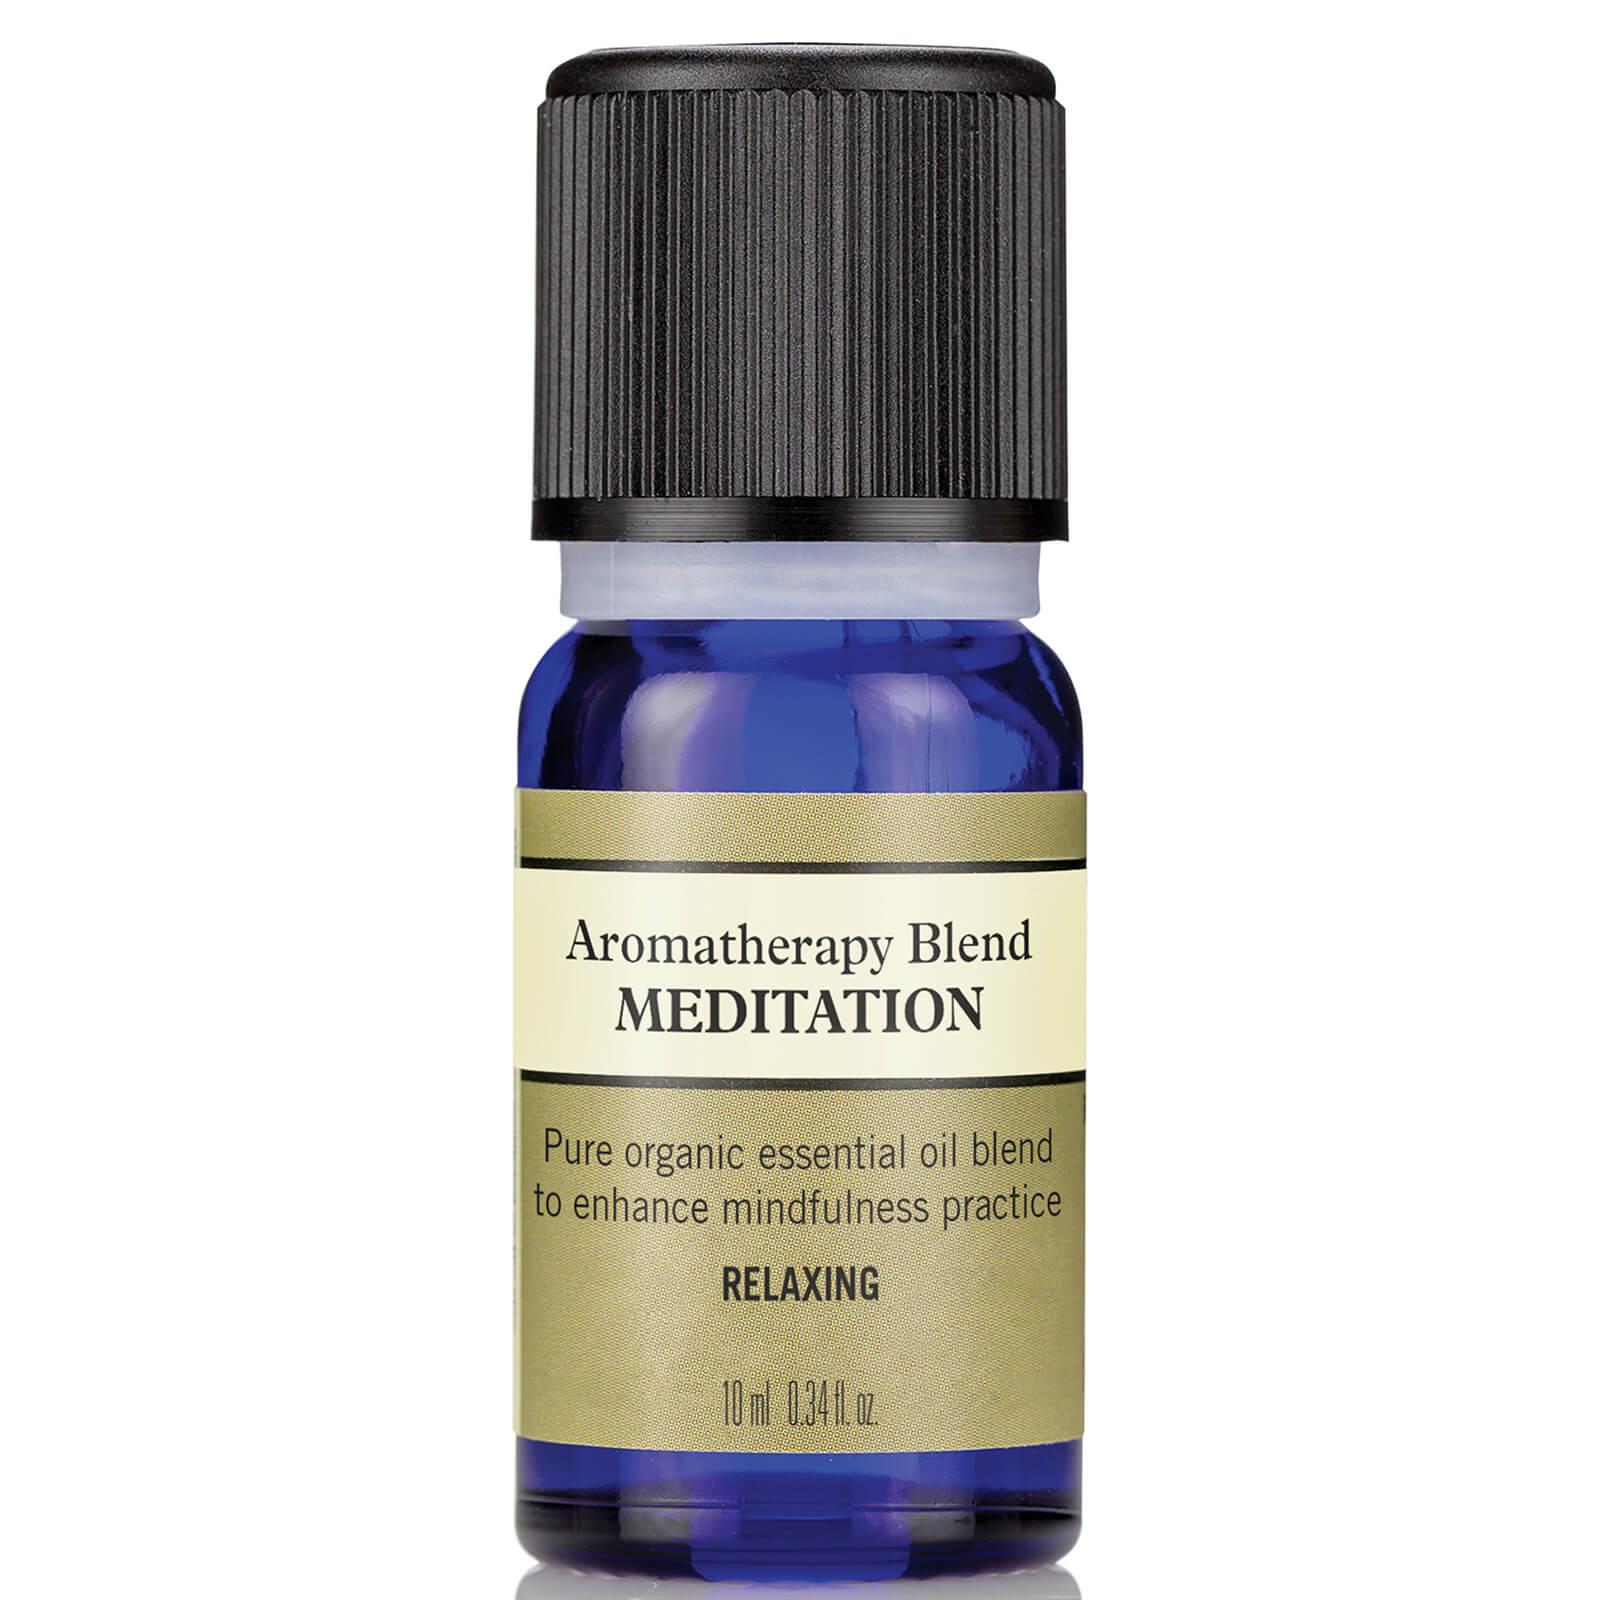 Neal's Yard Remedies Women's Aromatherapy Blend Balance Neal's Yard Remedies 10ml – Méditation